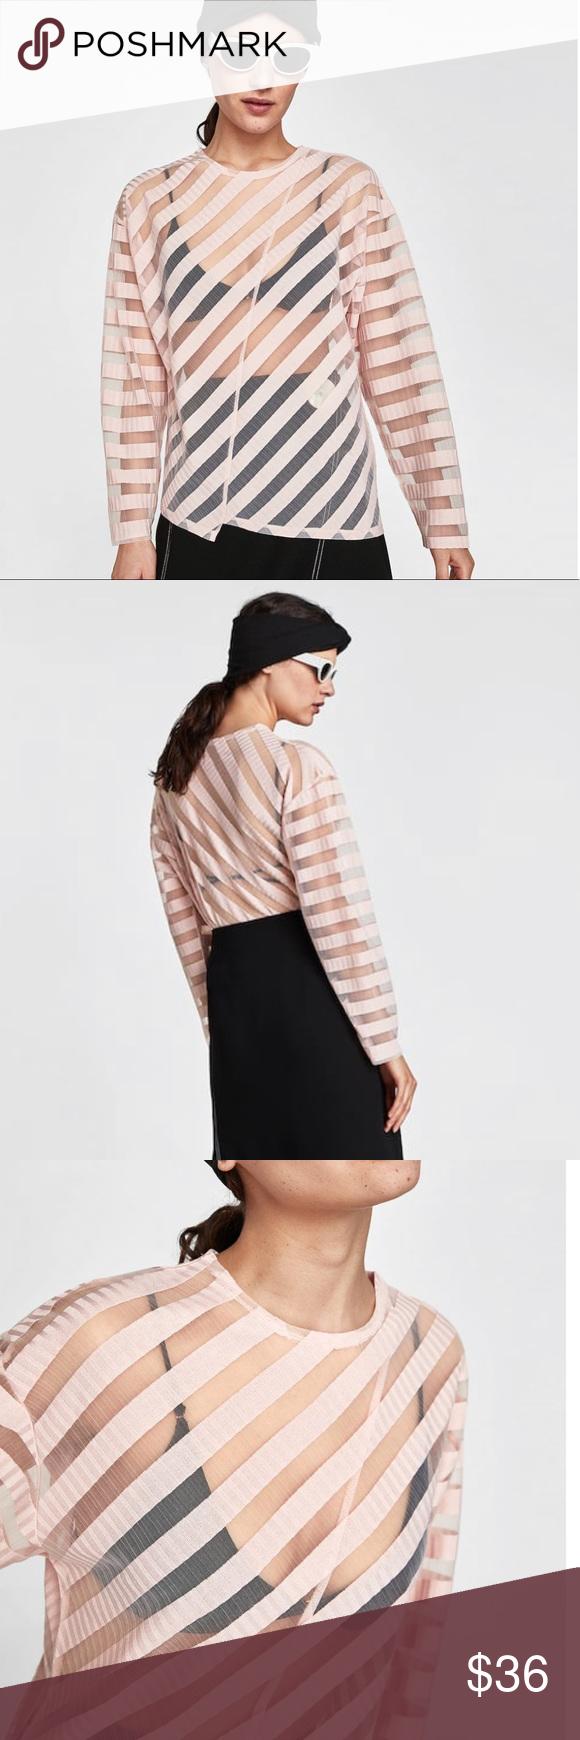 ec812186078e Zara Sheer T-Shirt With Stripes - NWT Zara round neck, long sleeve sheer t- shirt with stripes. 98% Polyester, 2% Elastane Color: light blush pink  Size: ...